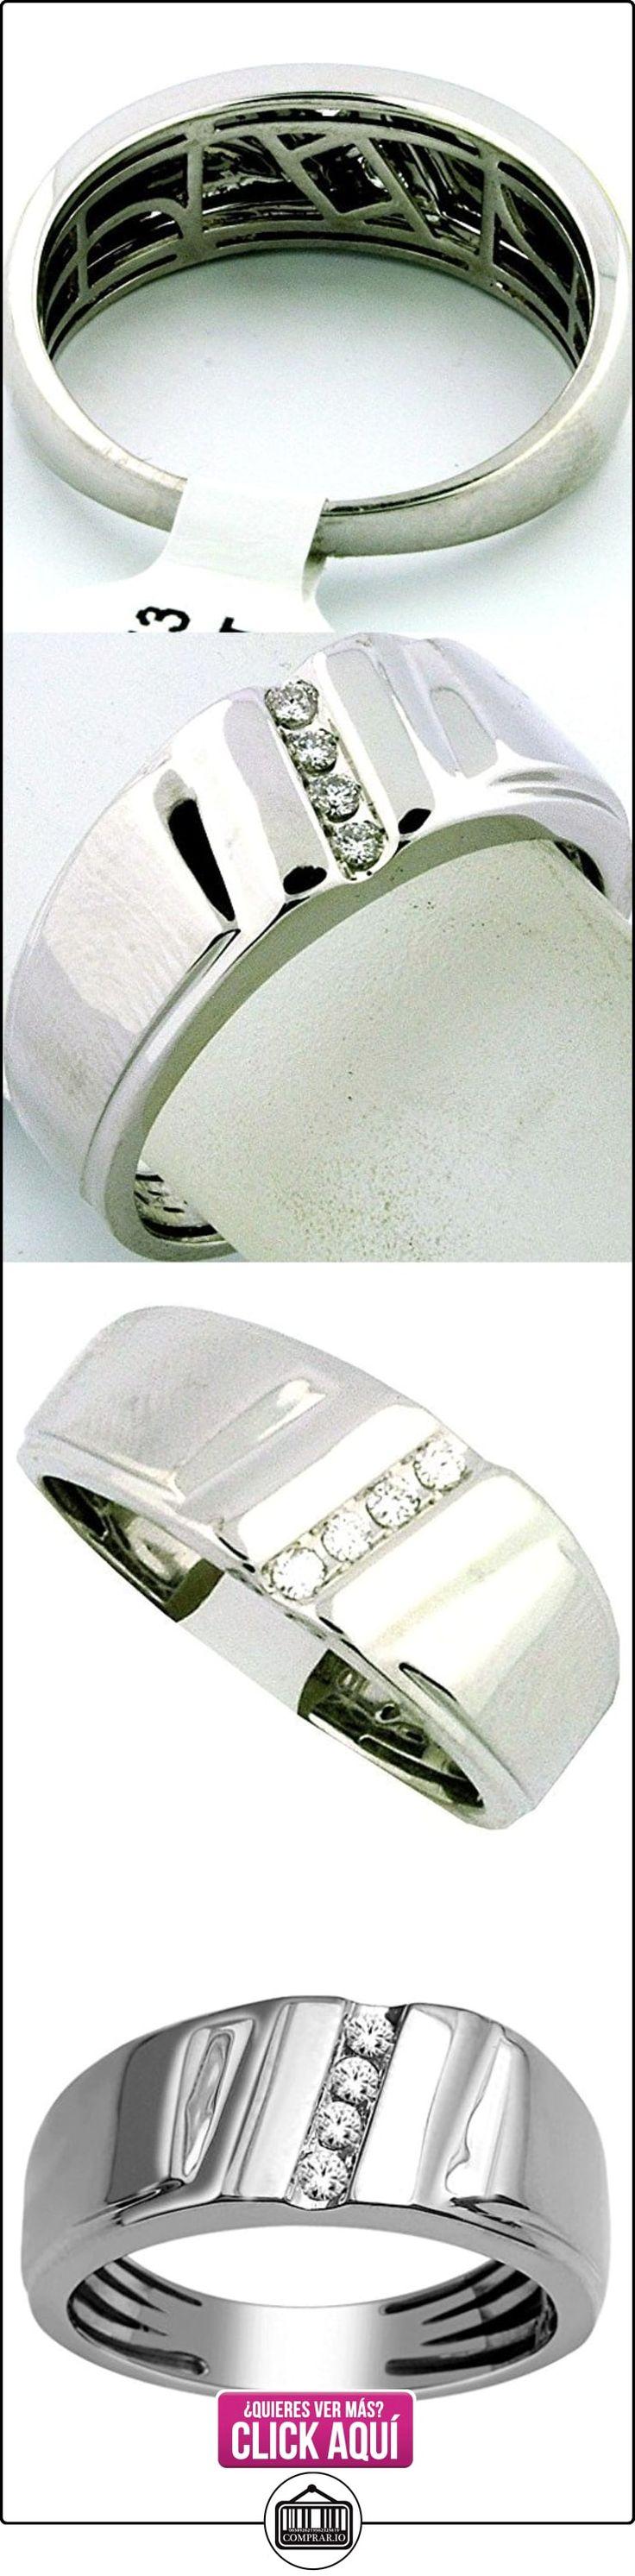 rings-midwestjewellery. com Hombre Boda Banda 10K oro blanco 8,5mm de ancho 1/10cttw Diamonds Comfort Fit (I/J Color 0,1quilates)  ✿ Joyas para hombres especiales - lujo ✿ ▬► Ver oferta: https://comprar.io/goto/B00O2ESSW2